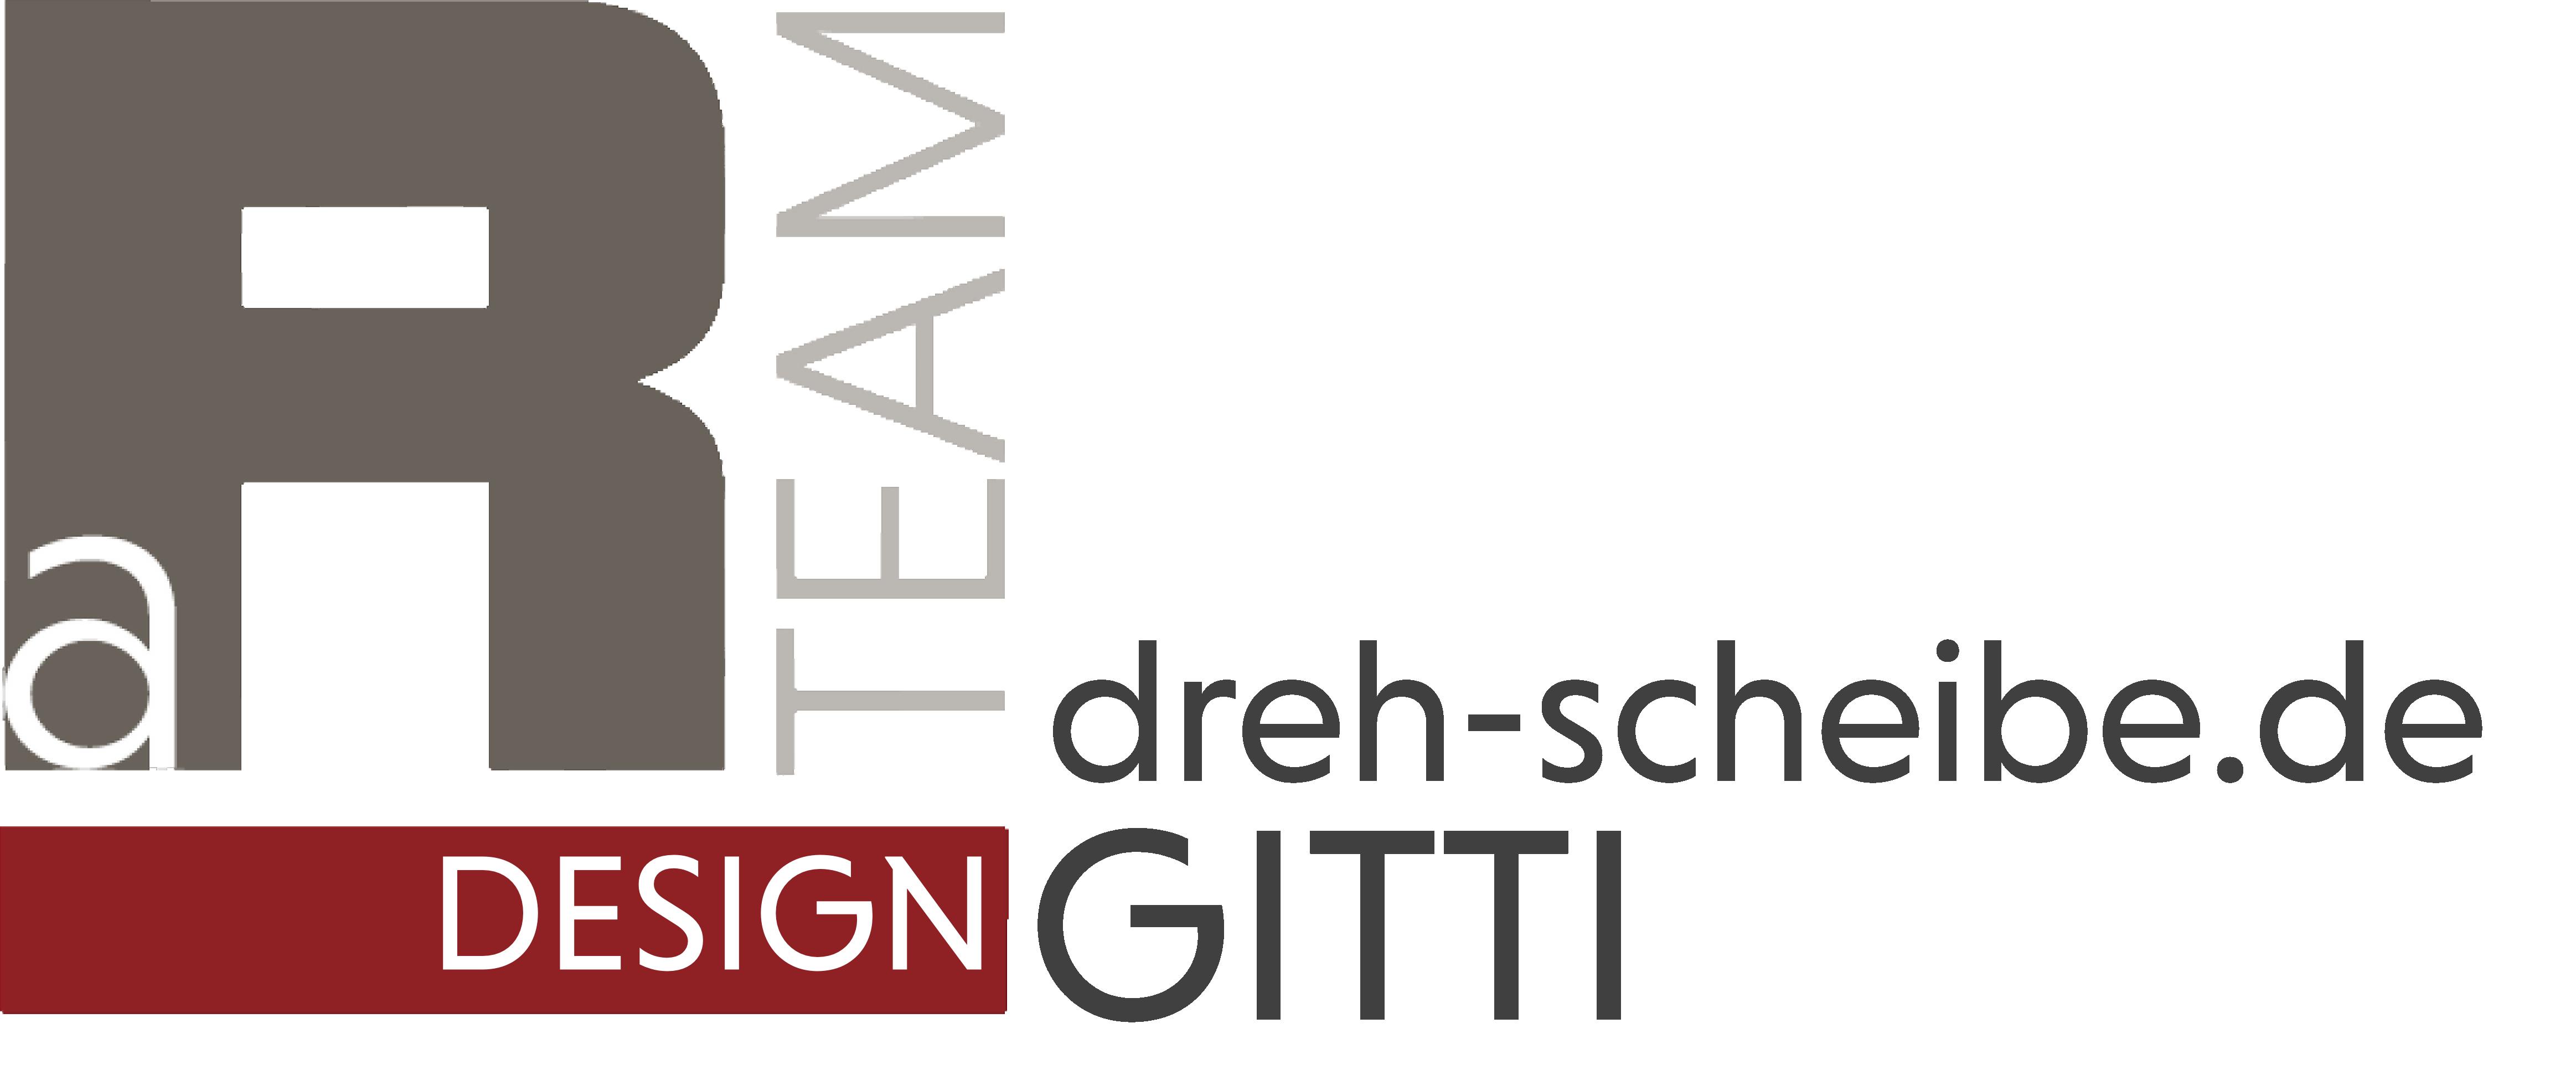 Design_aR_Gitti_anthrazit